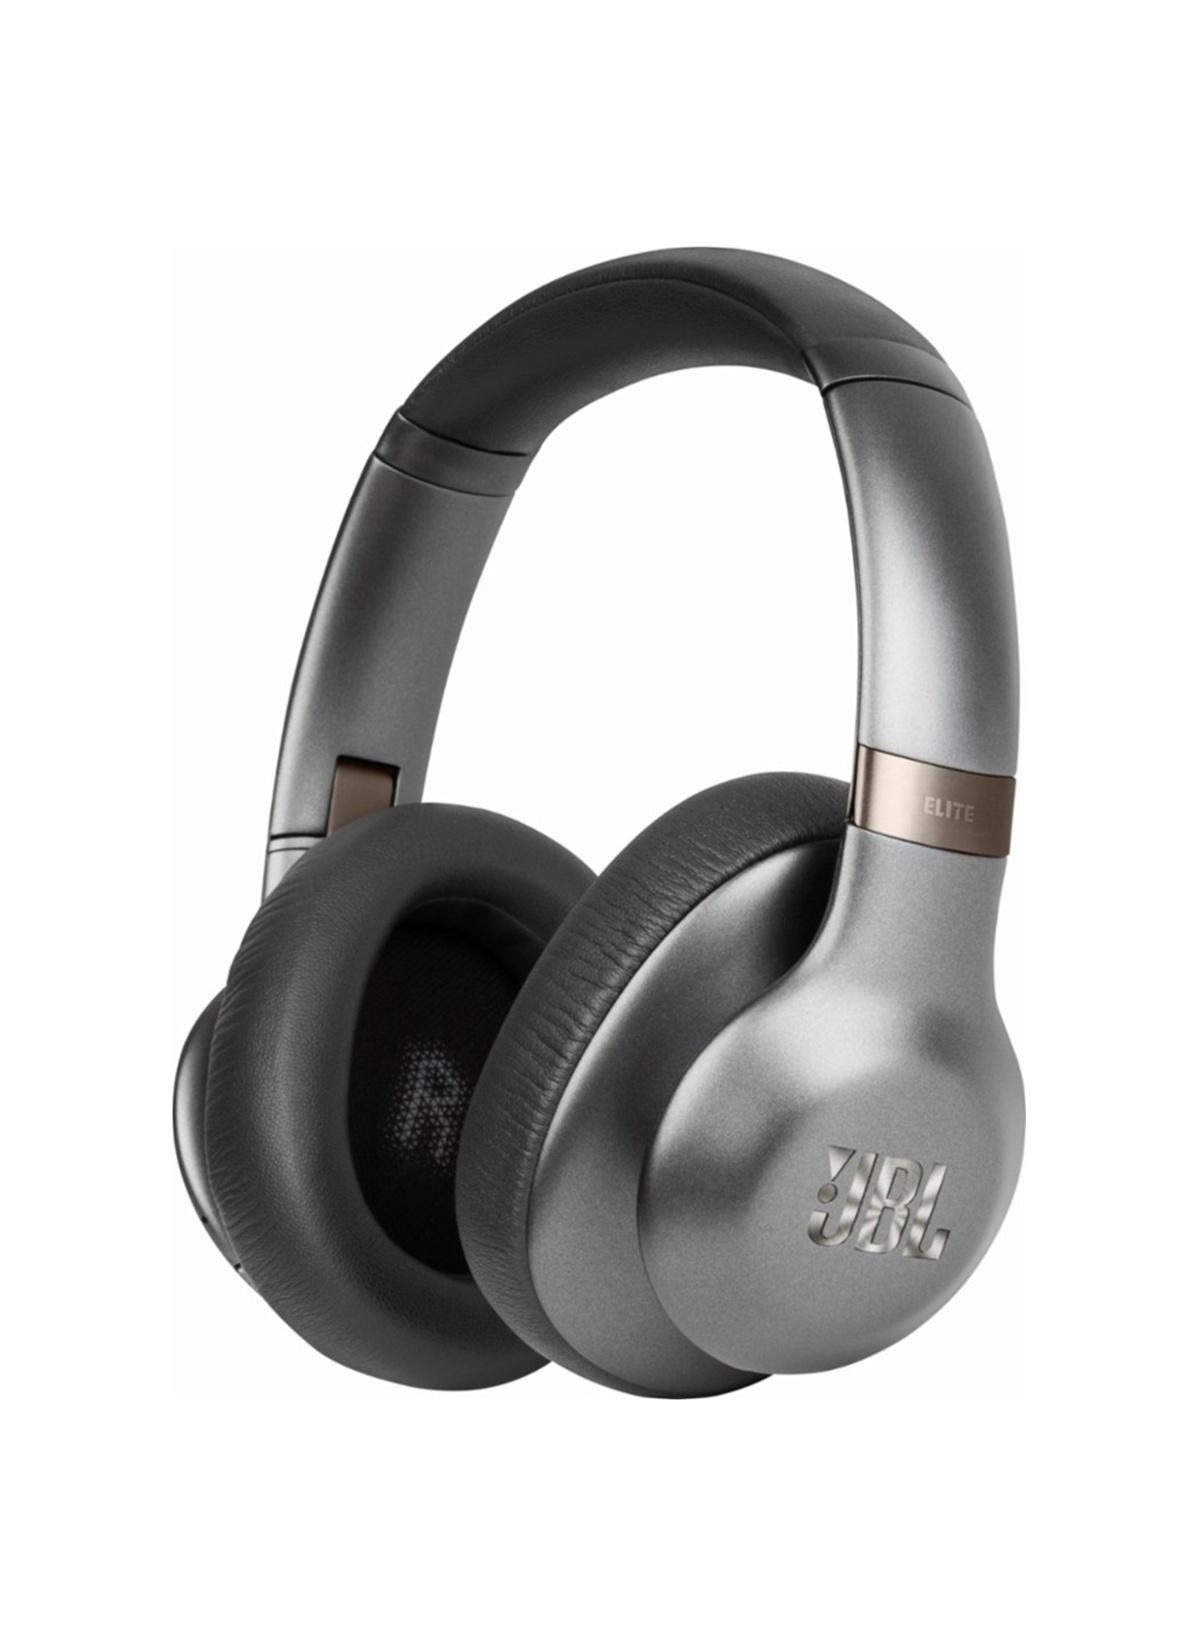 Standart JBL 750NC Koyu Gri Wireless Bluetooth Mikrofonlu Kulak Üstü Kulaklık